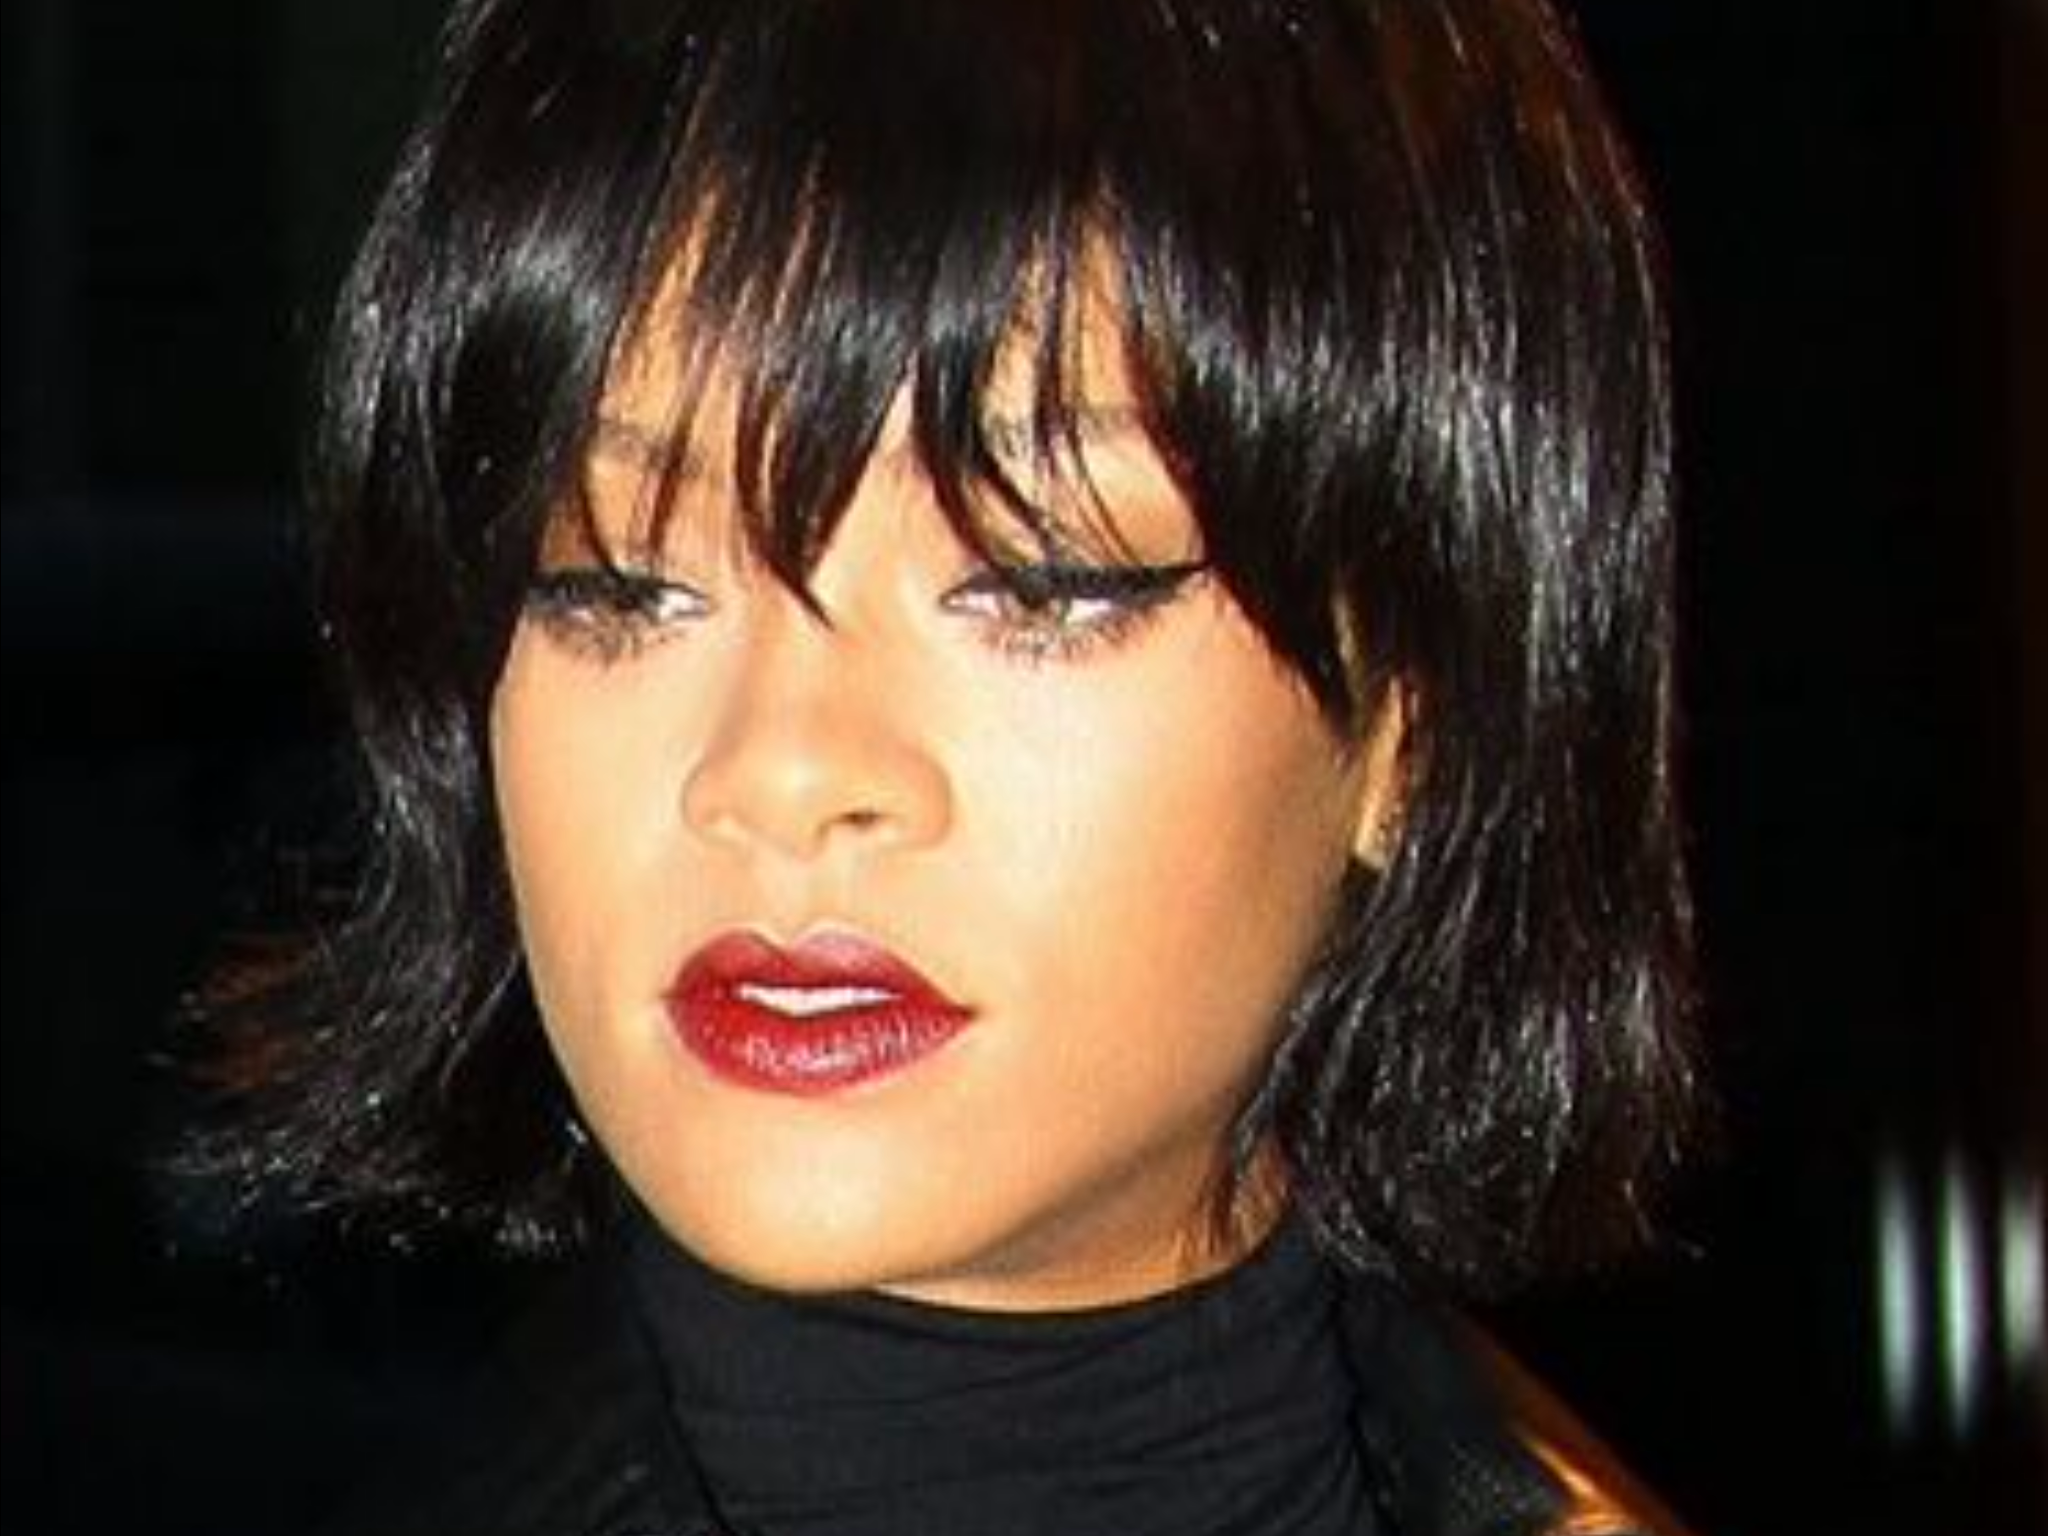 Pin By Mimi Smoments On Riri Why She Slays In 2020 Rihanna Short Hair Short Hair Styles Bob Hairstyles